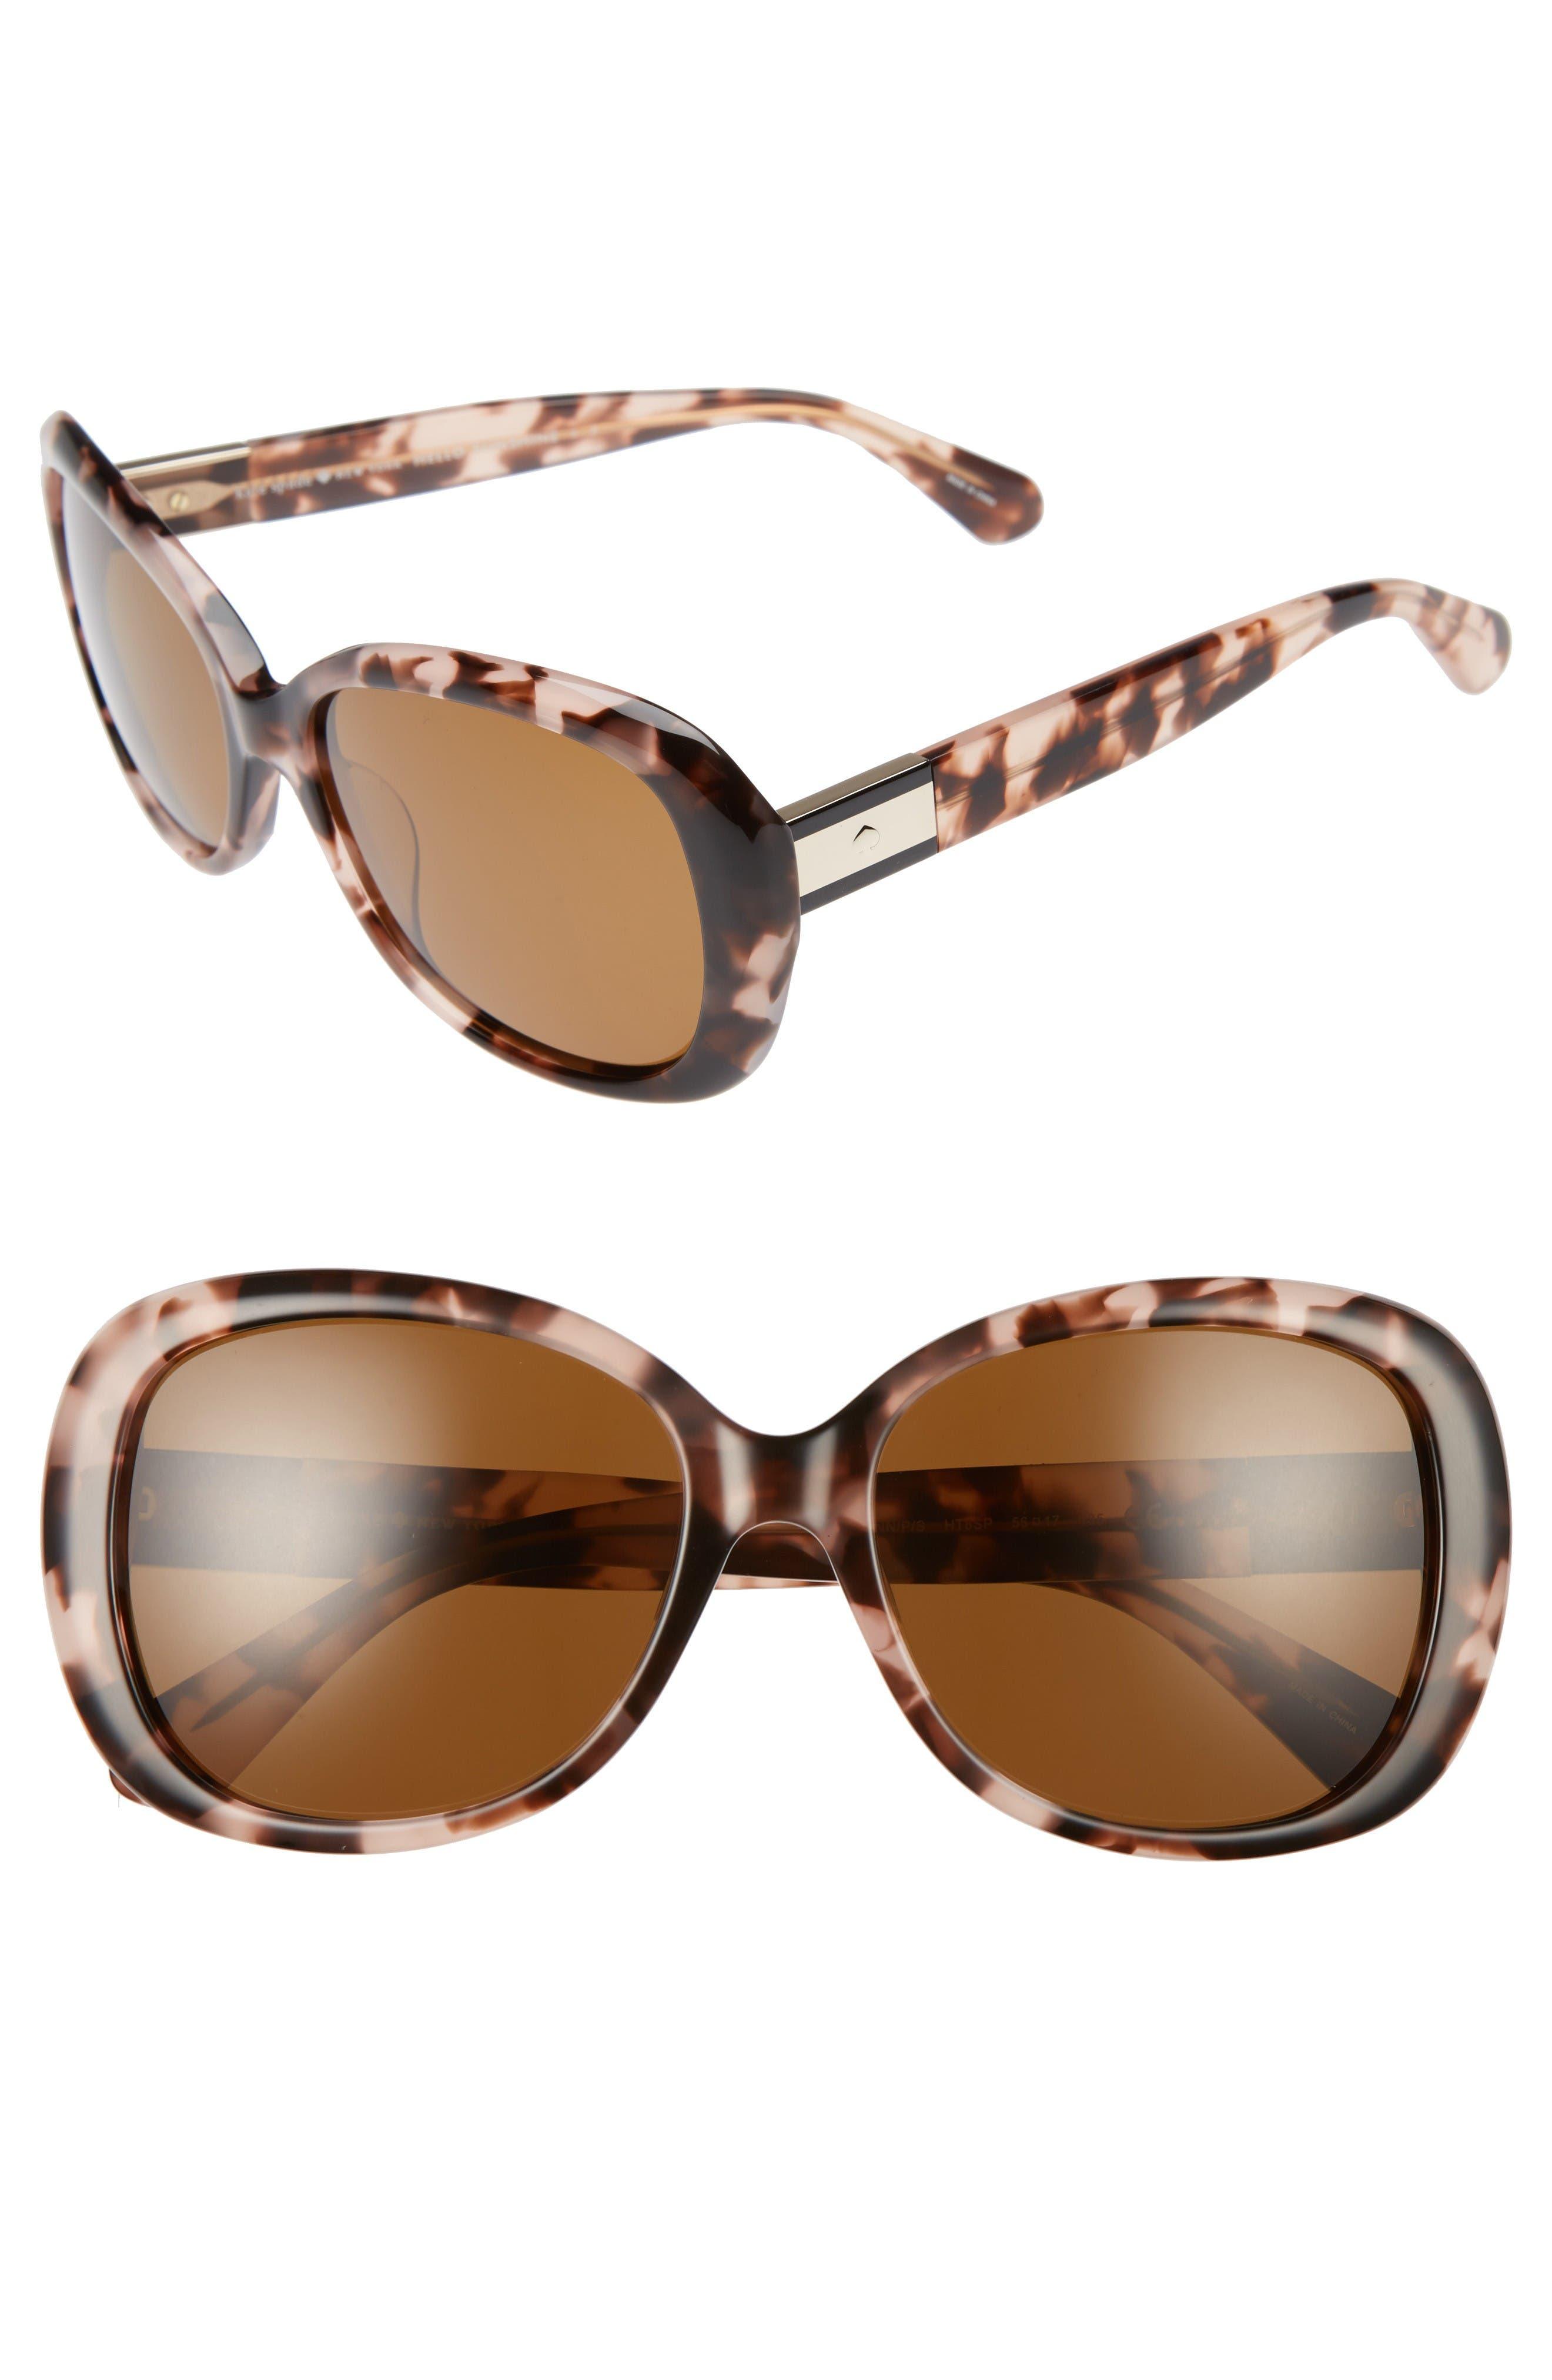 judyann 56mm Sunglasses,                             Main thumbnail 1, color,                             Pink/ Havana